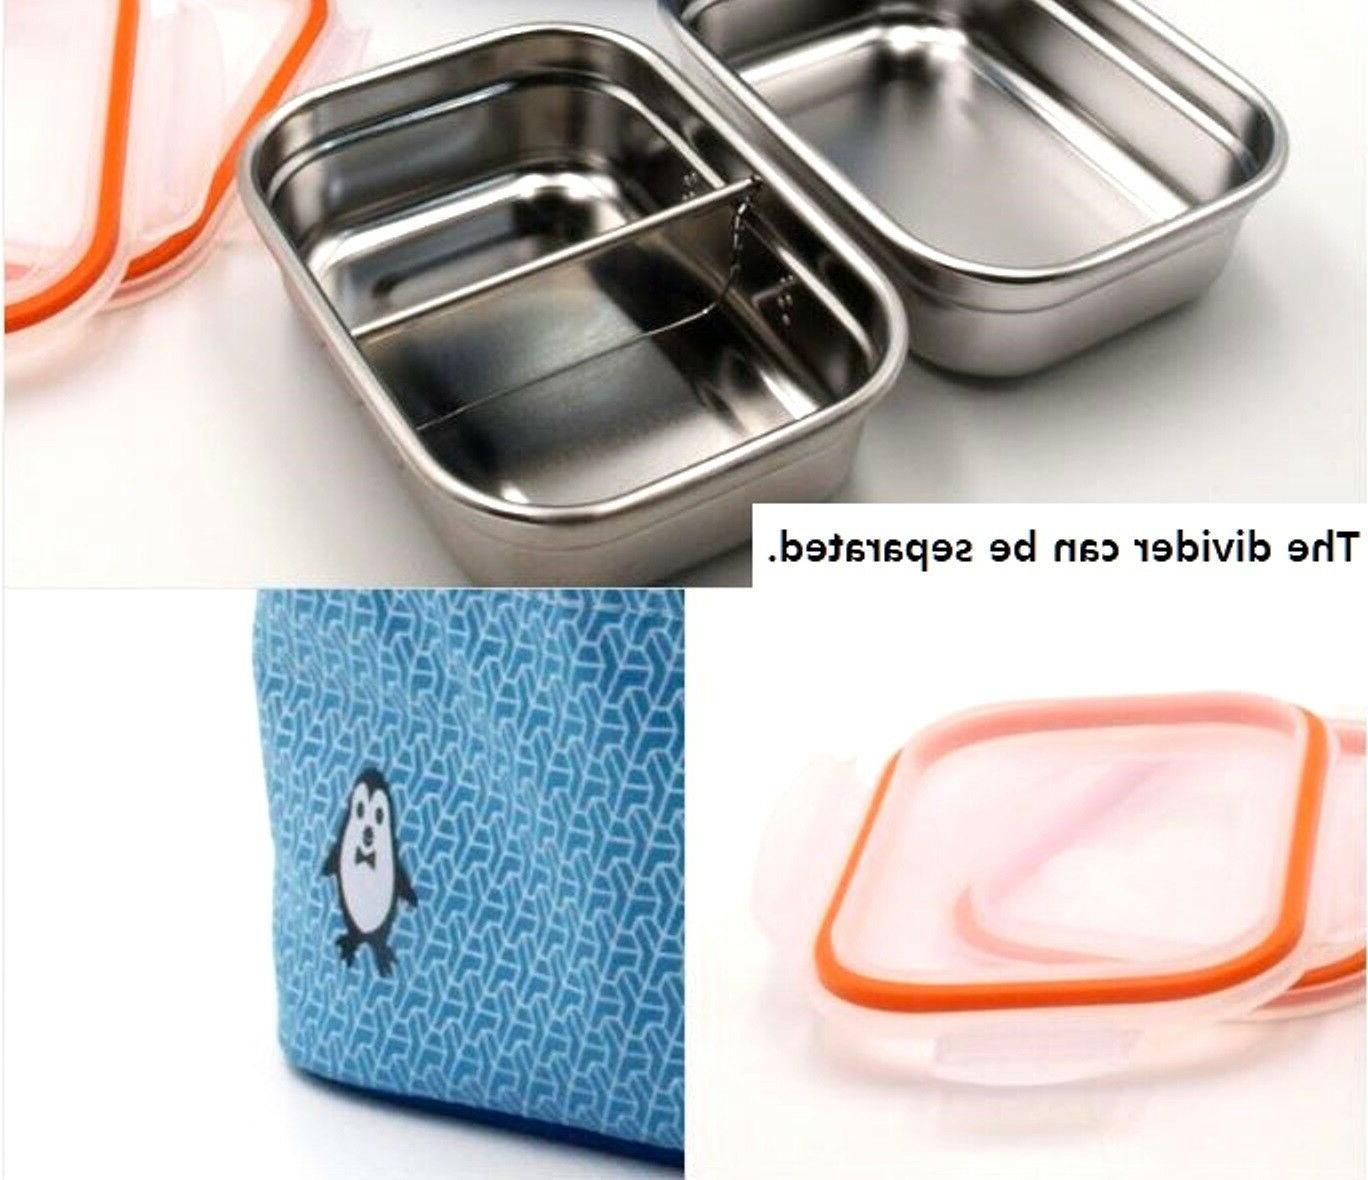 ALLPOOMLOCK Lunch Box Bag Shaker